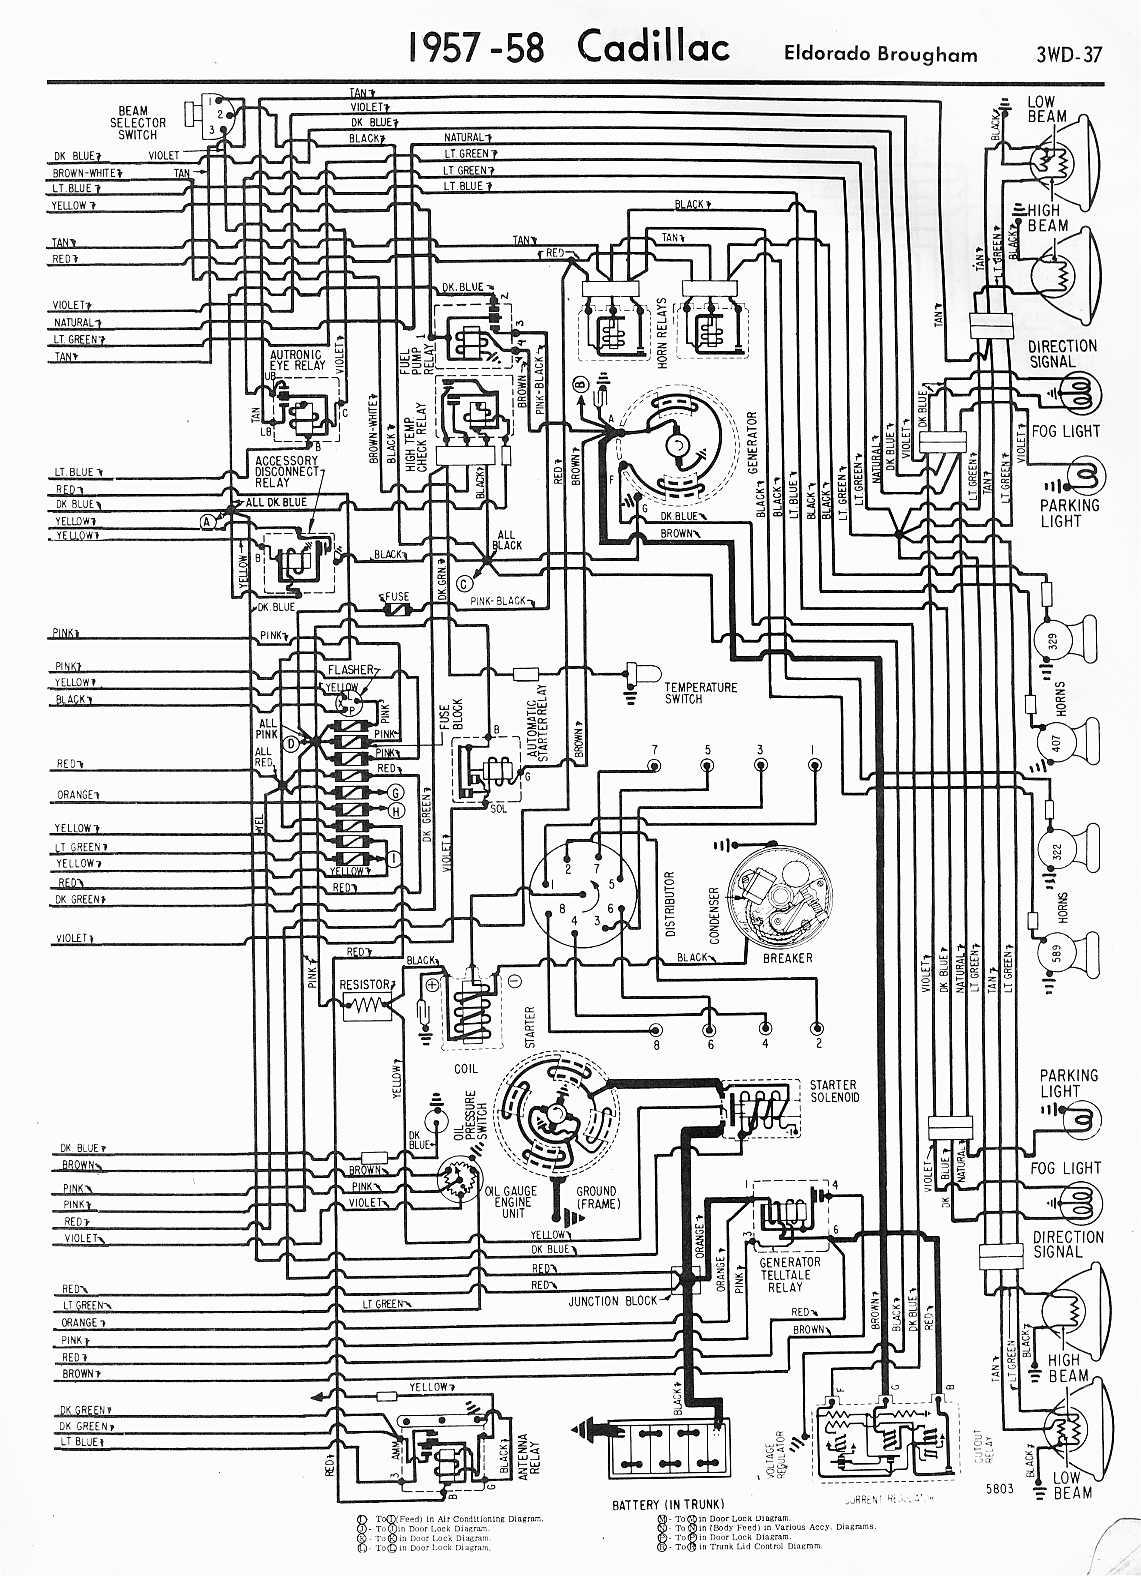 1957 1958 cadillac eldorado brougham wiring diagram all chevy pickup wiring diagram cadillac deville wiring diagram [ 1141 x 1576 Pixel ]